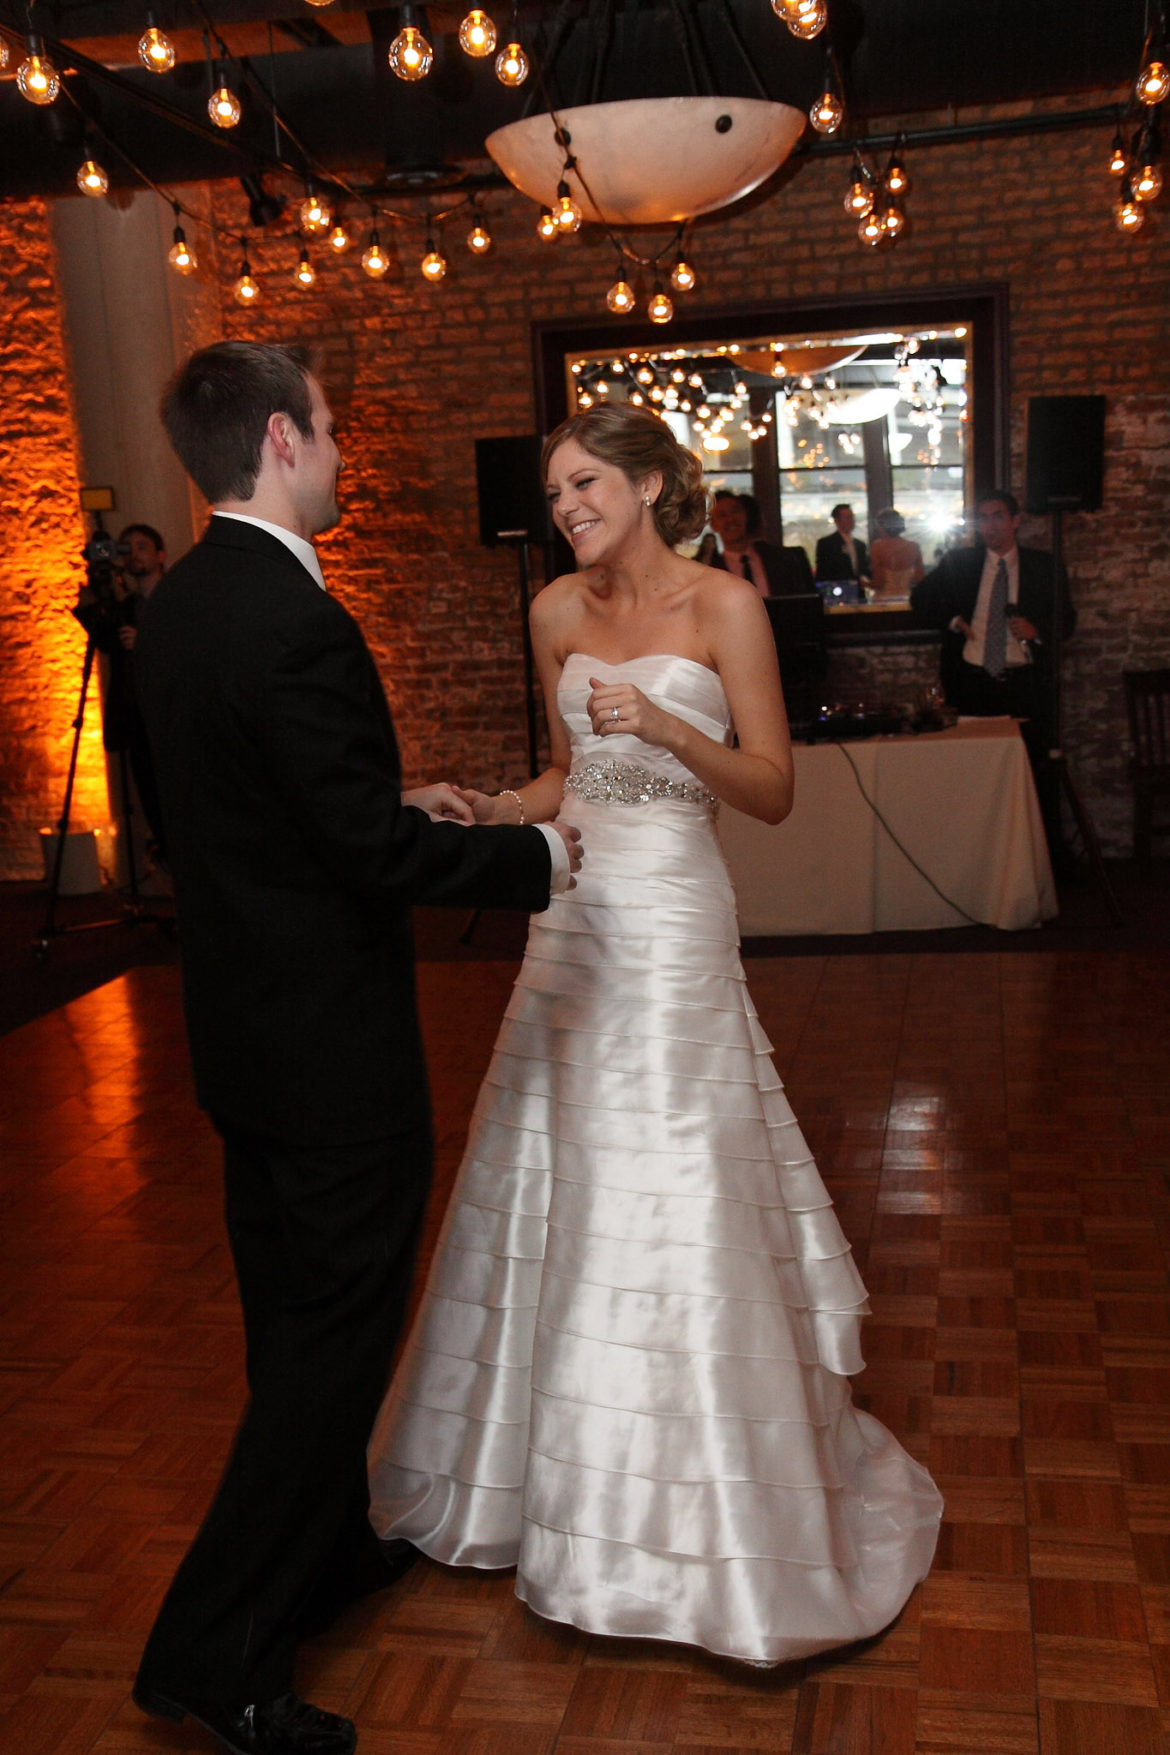 Elegant_Event_Lighting_Chicago_River_Roast_Wedding_Amber_Uplighting_Rustic_Cafe_Globe_Lighting_First_Dance